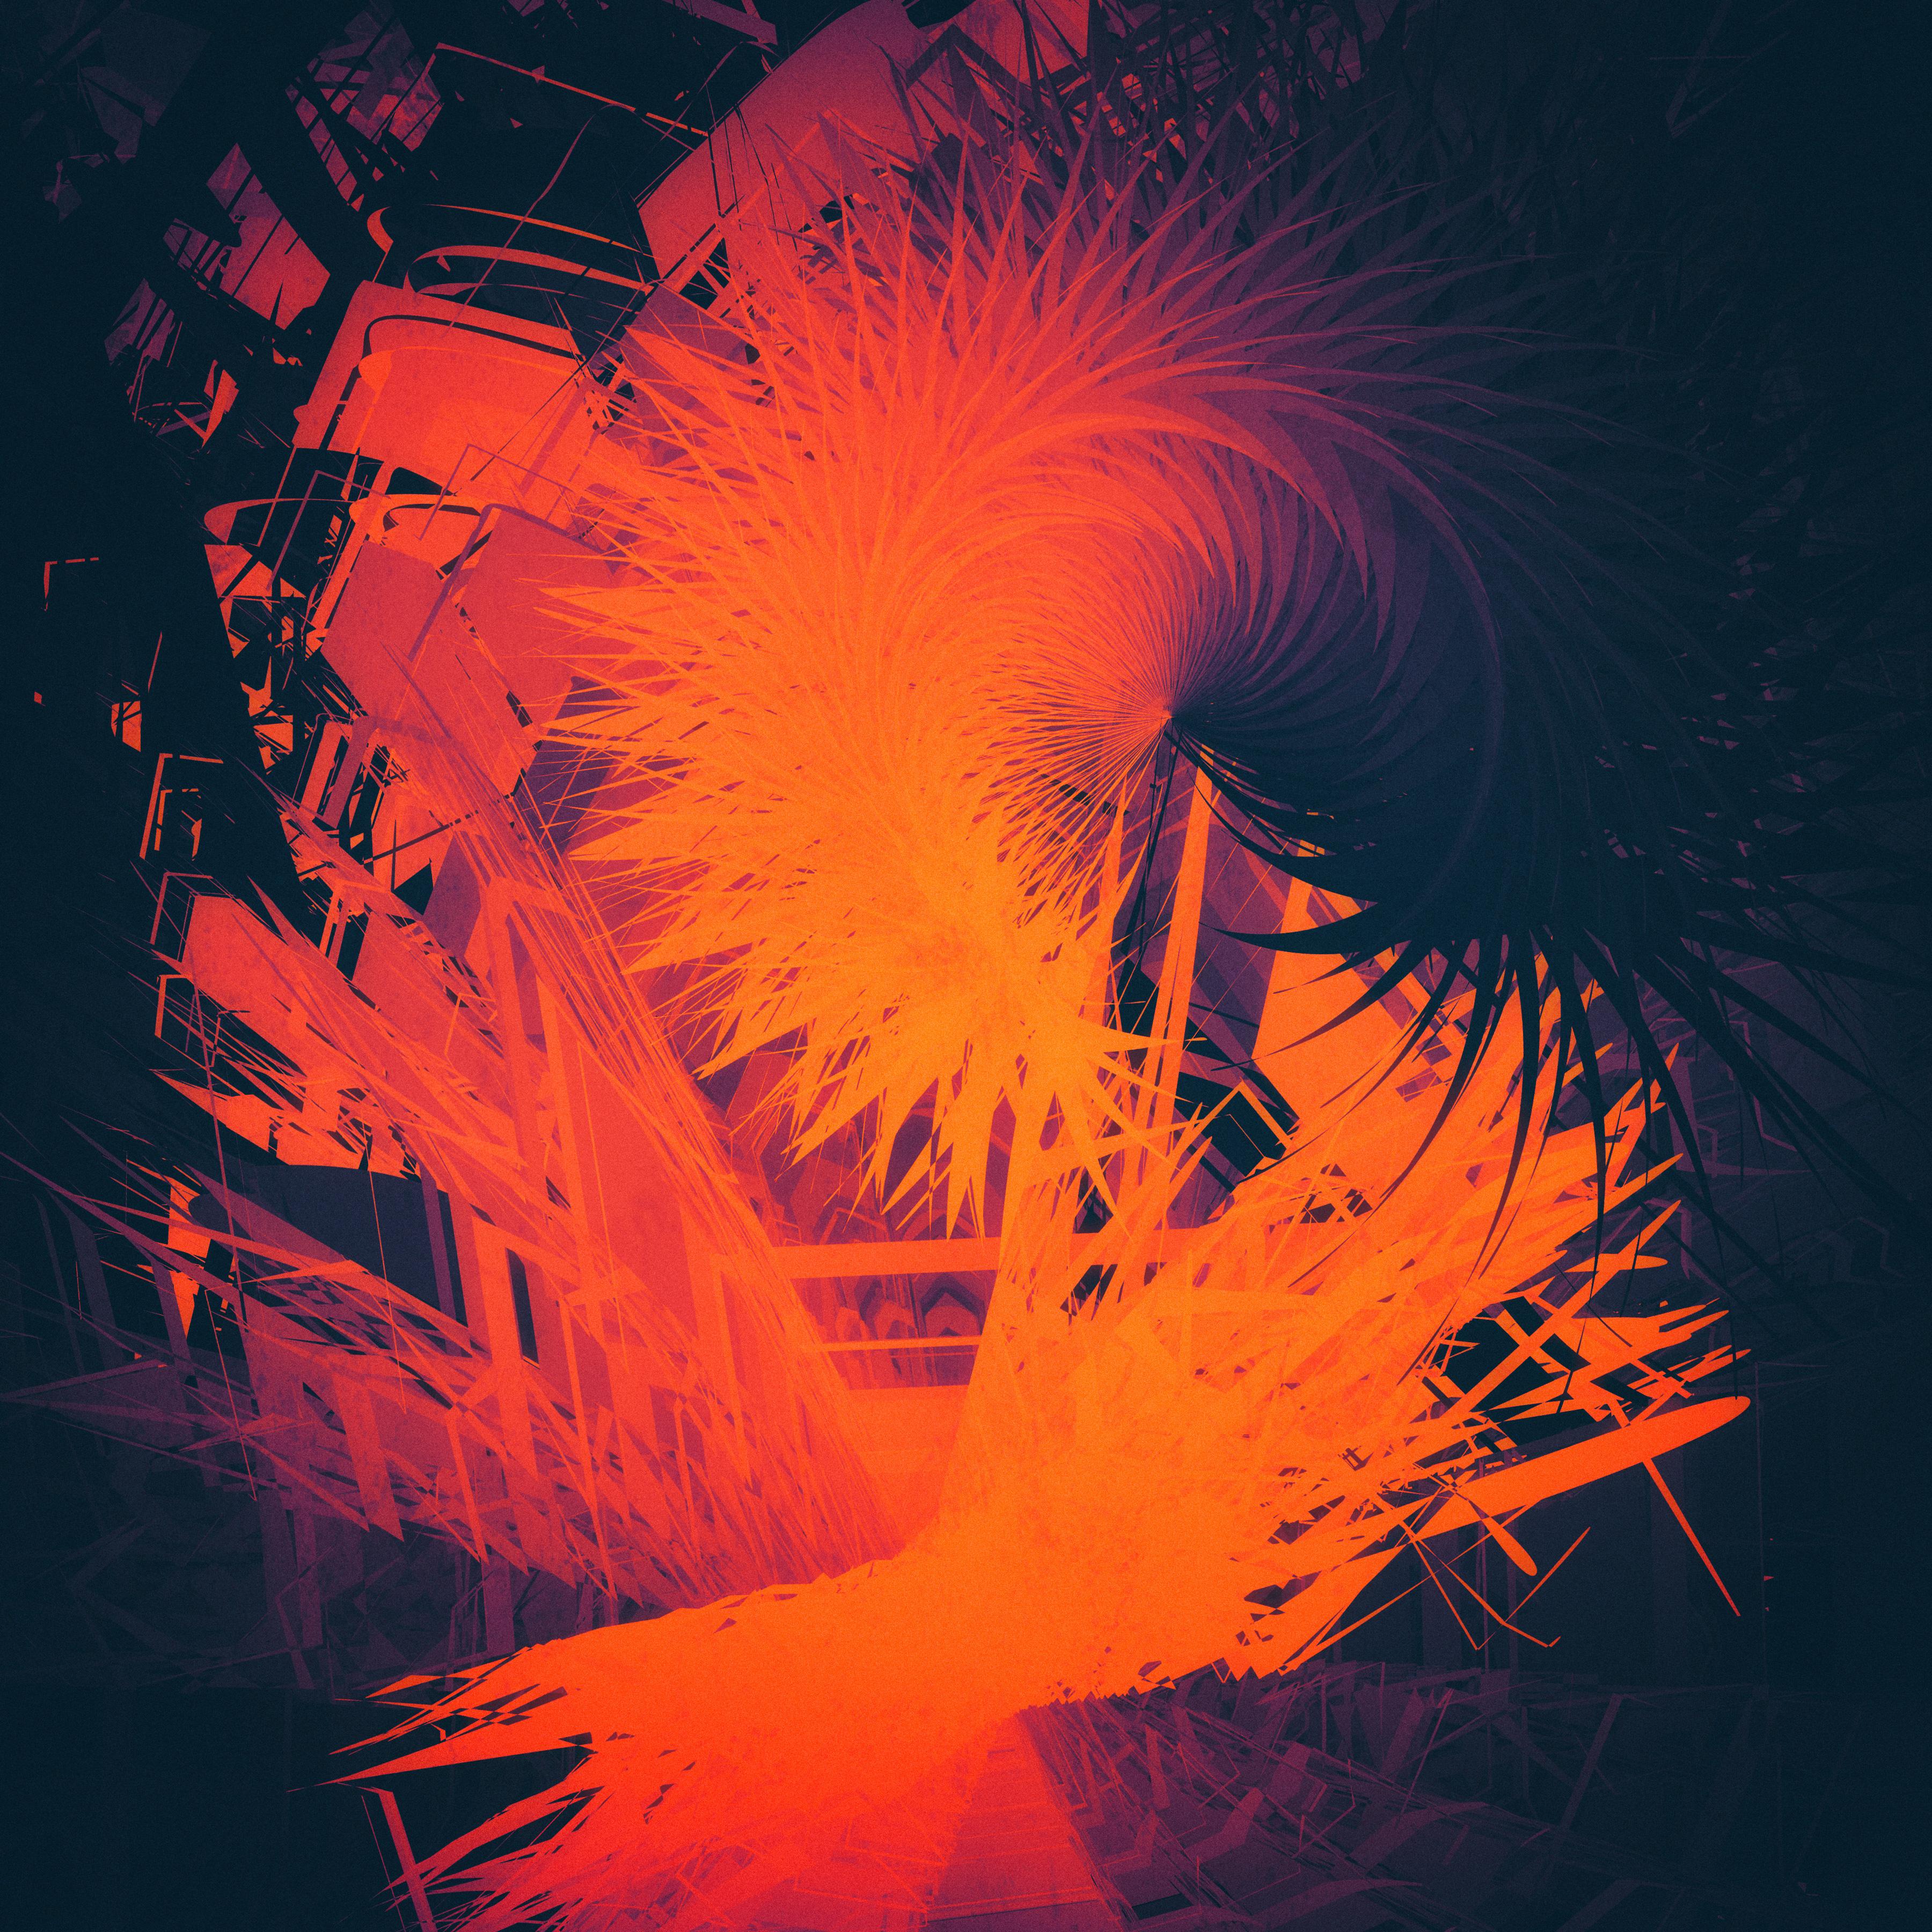 Illustration Digital Arts 4k, HD Abstract, 4k Wallpapers